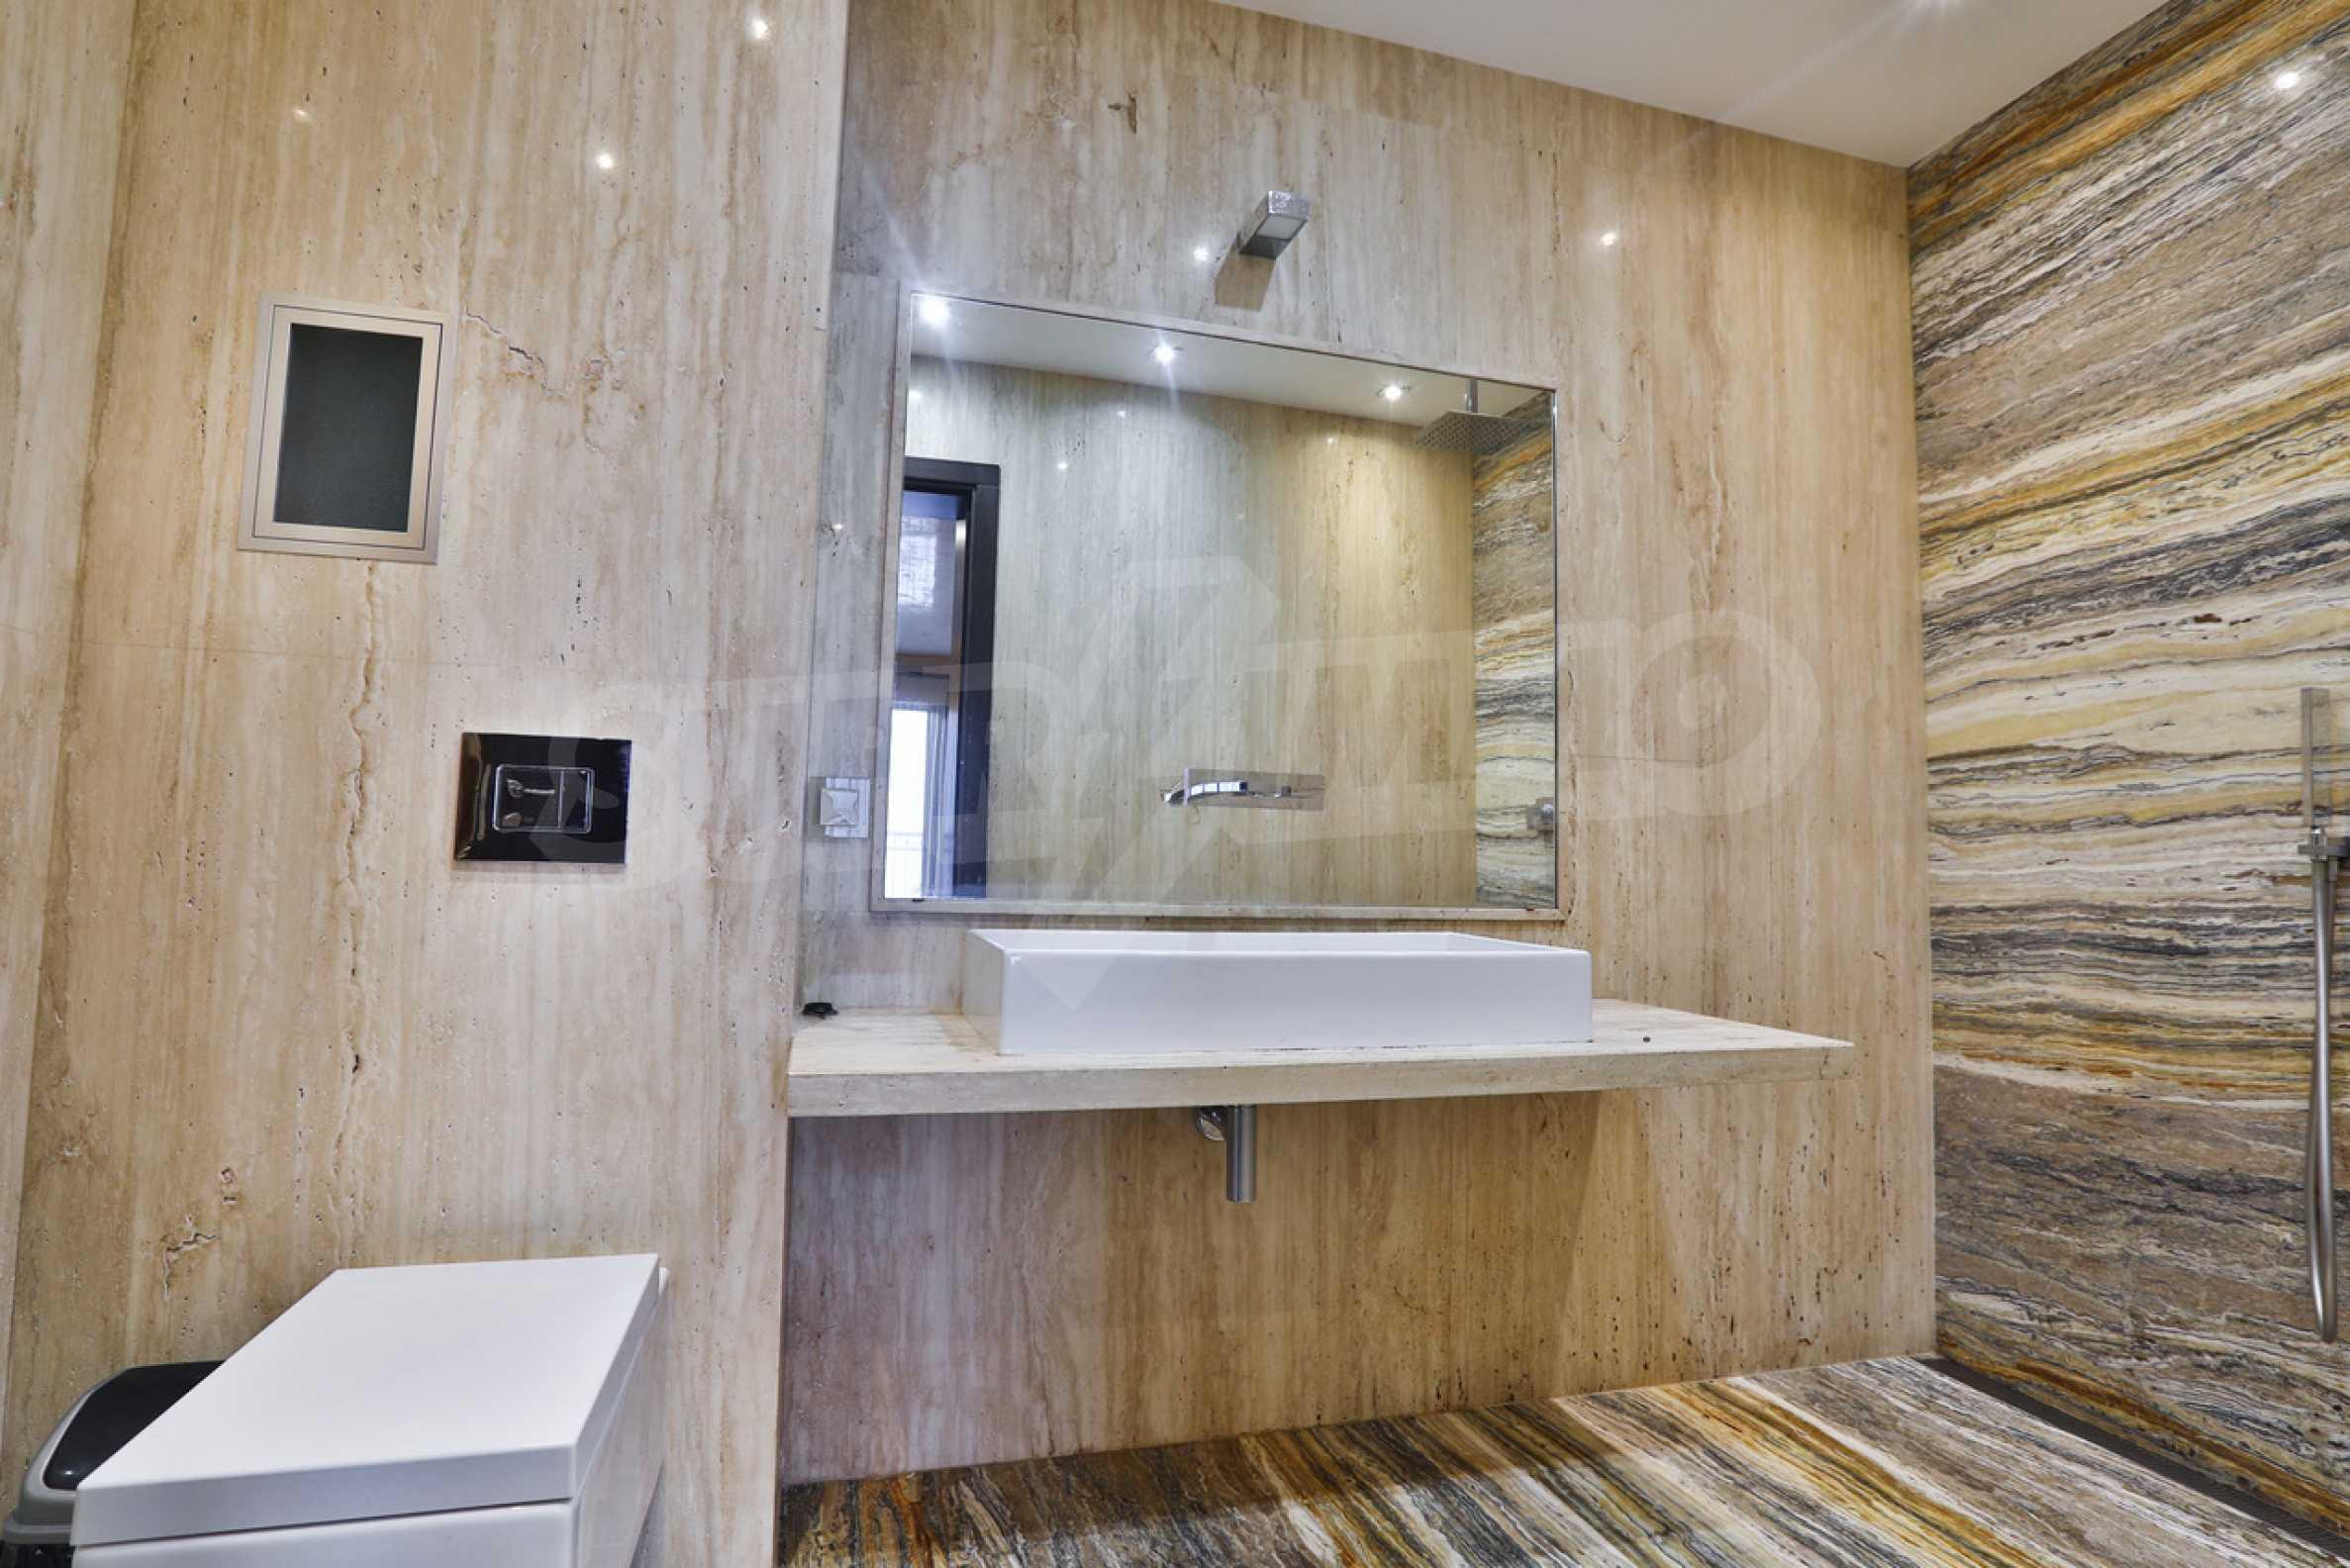 2-bedroom apartment in Sofia 11